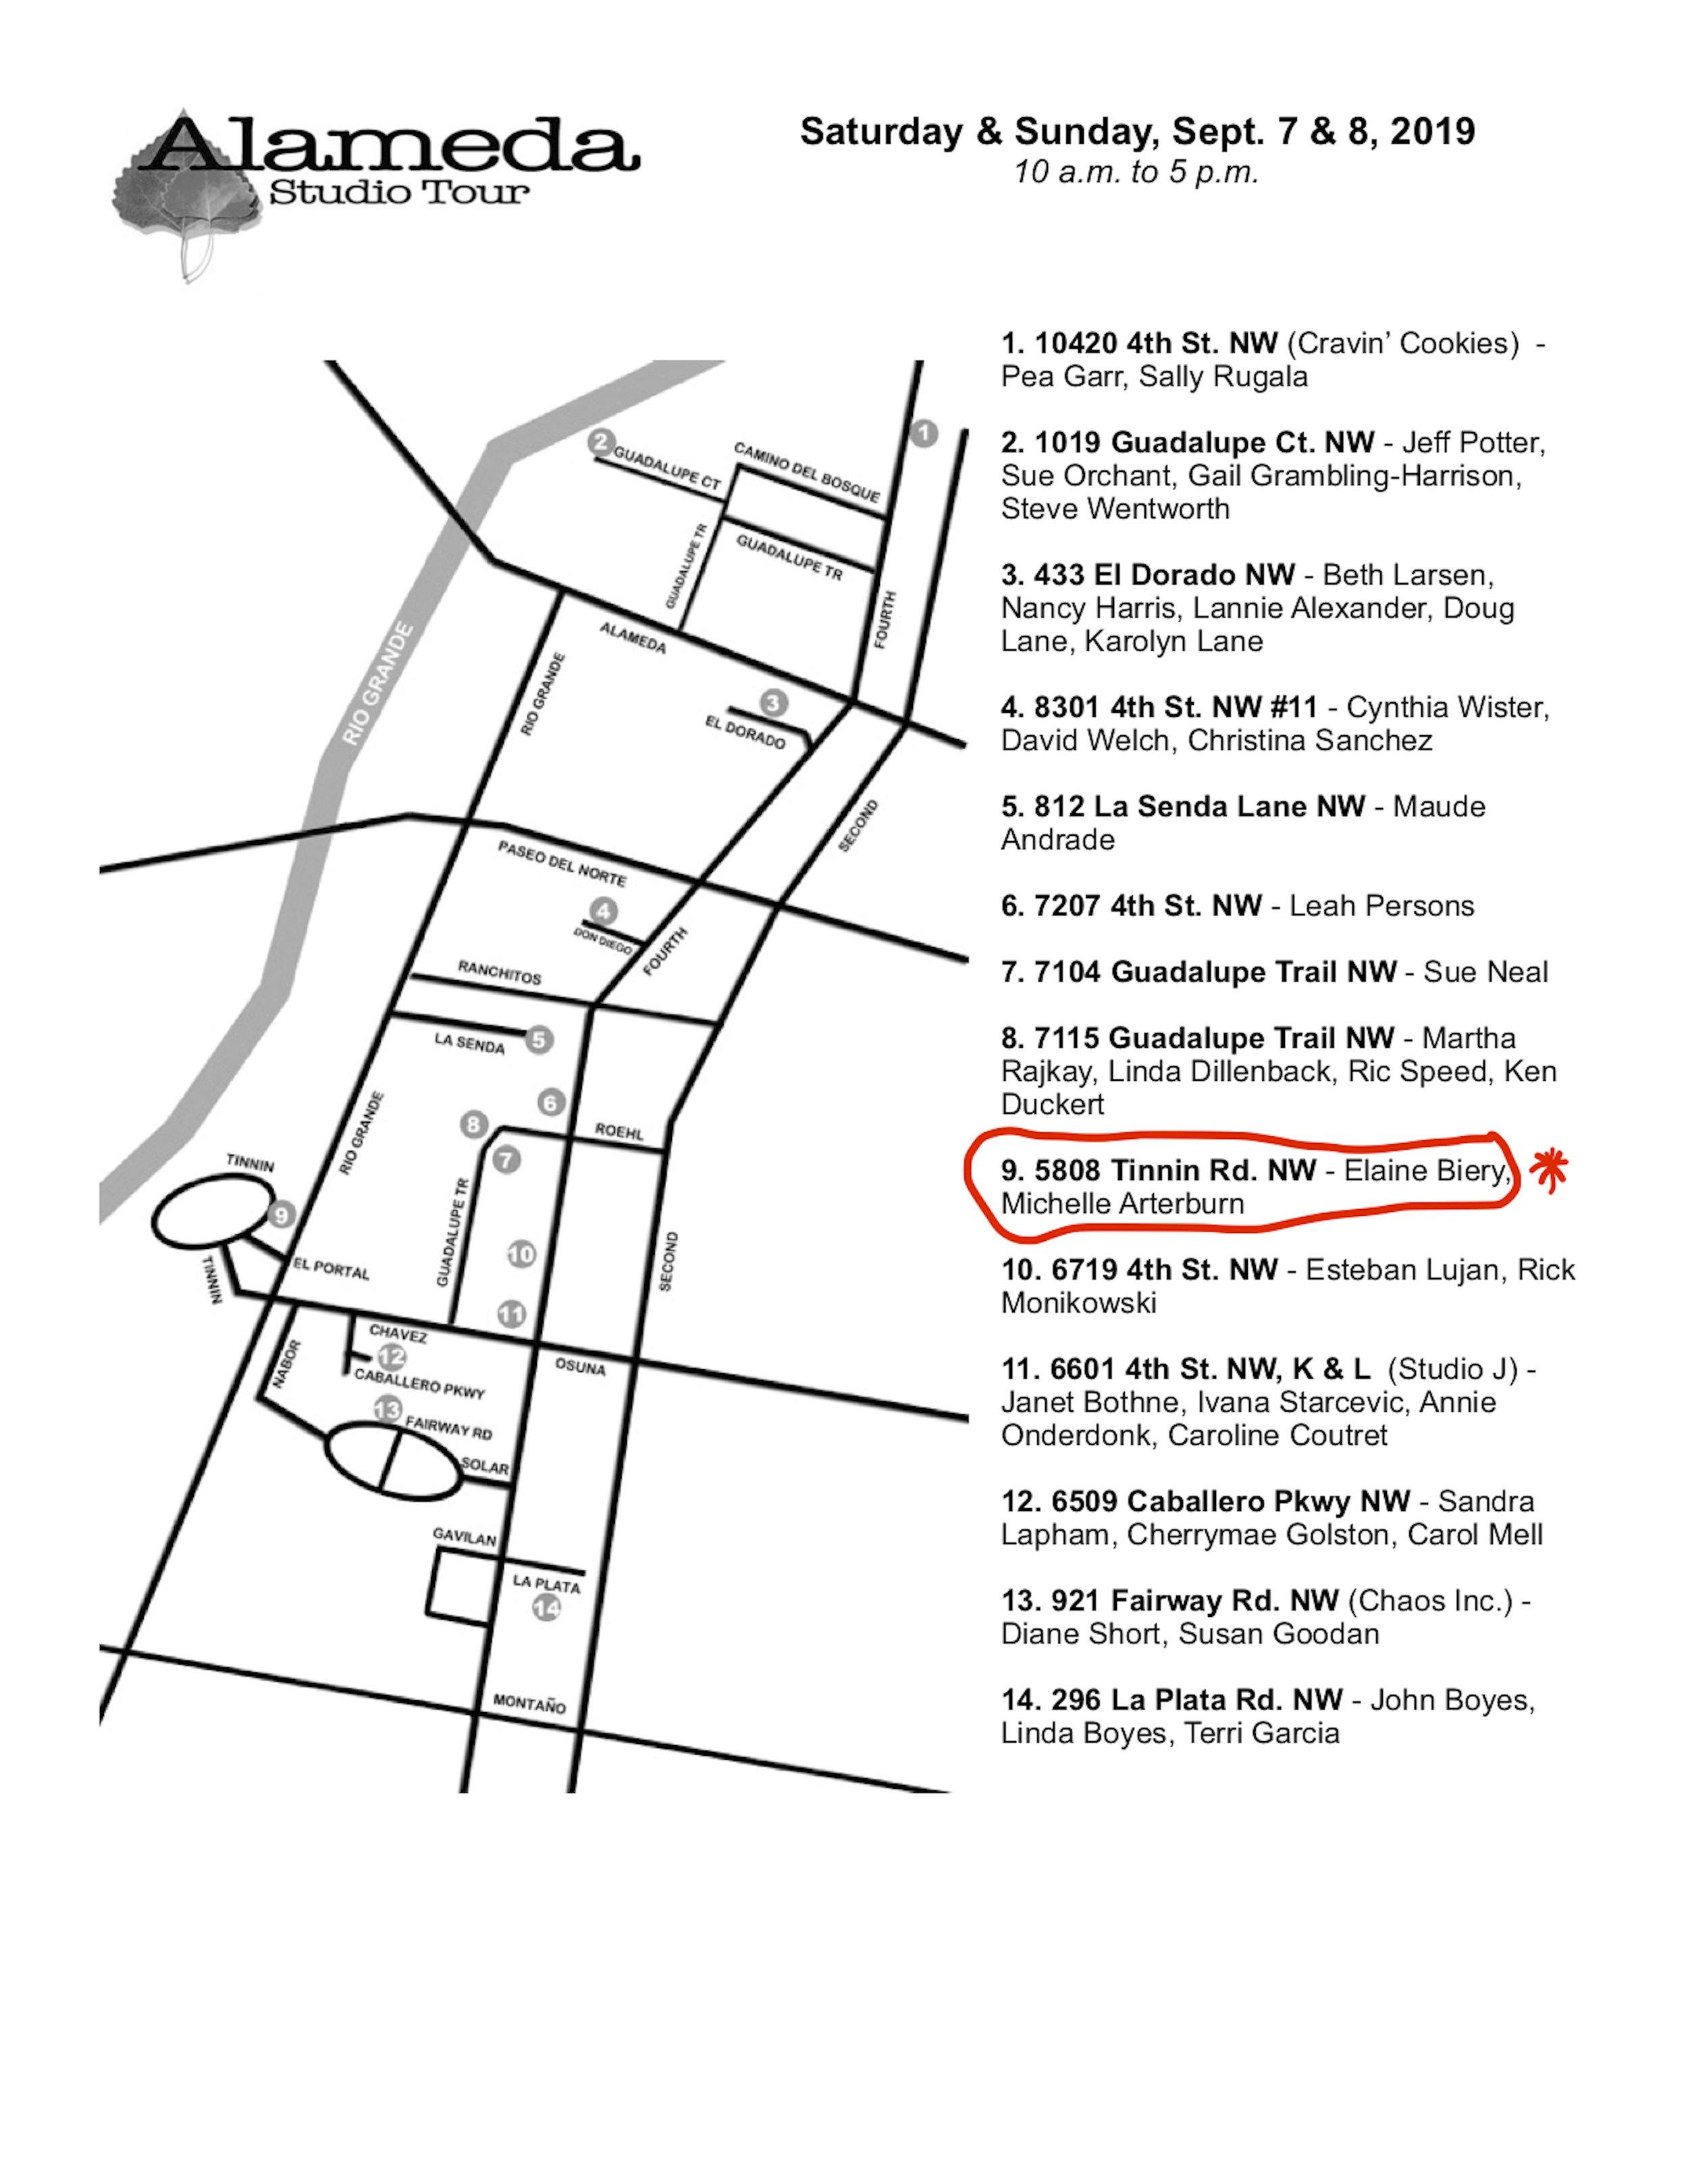 Alameda Studio Tour Map